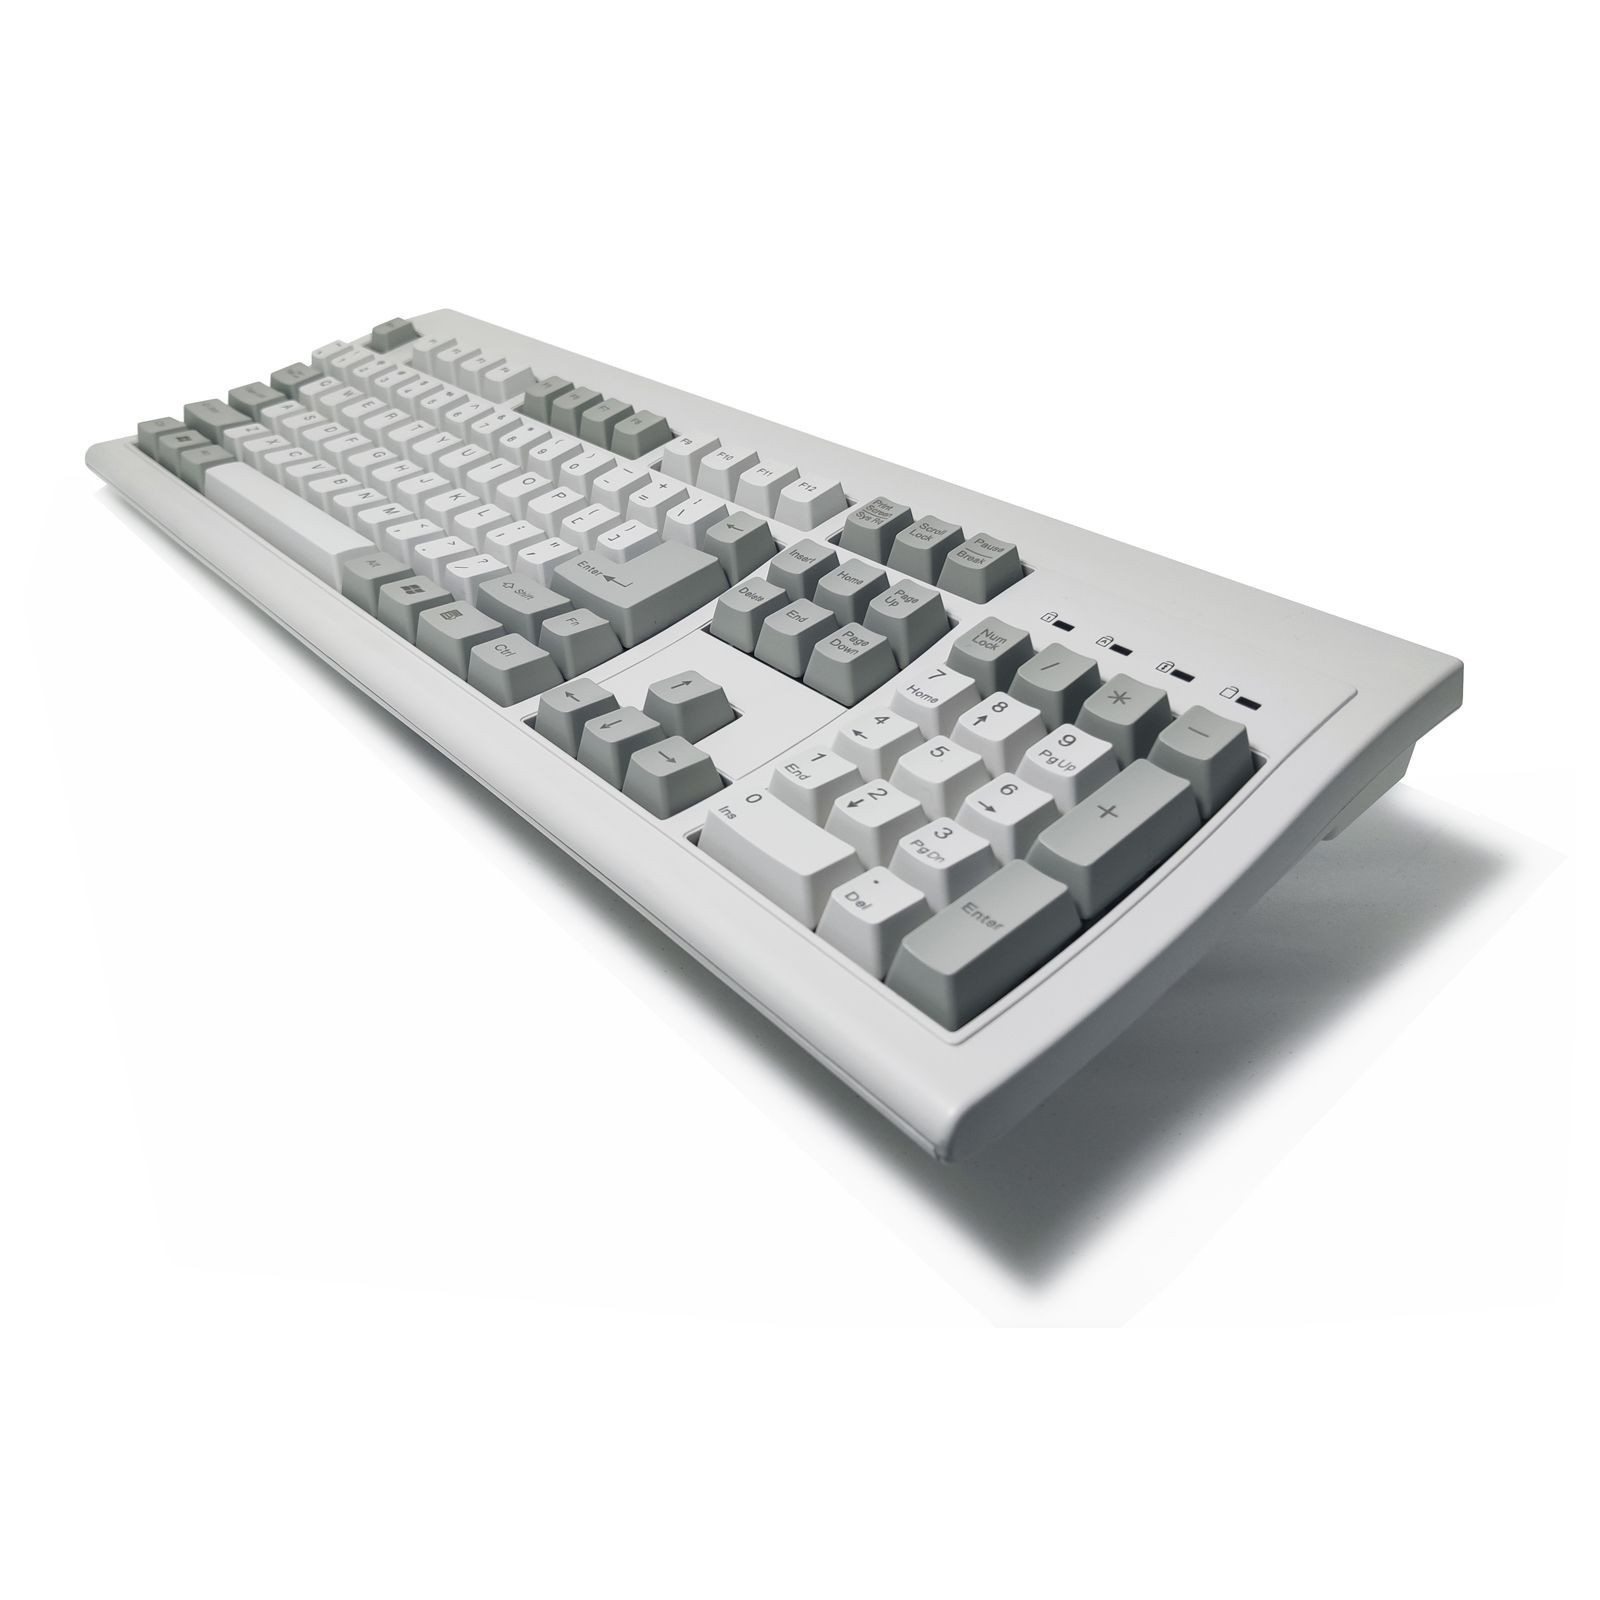 Classic Full Size USB Keyboard w/ 24 anti-ghost Key KB-6868